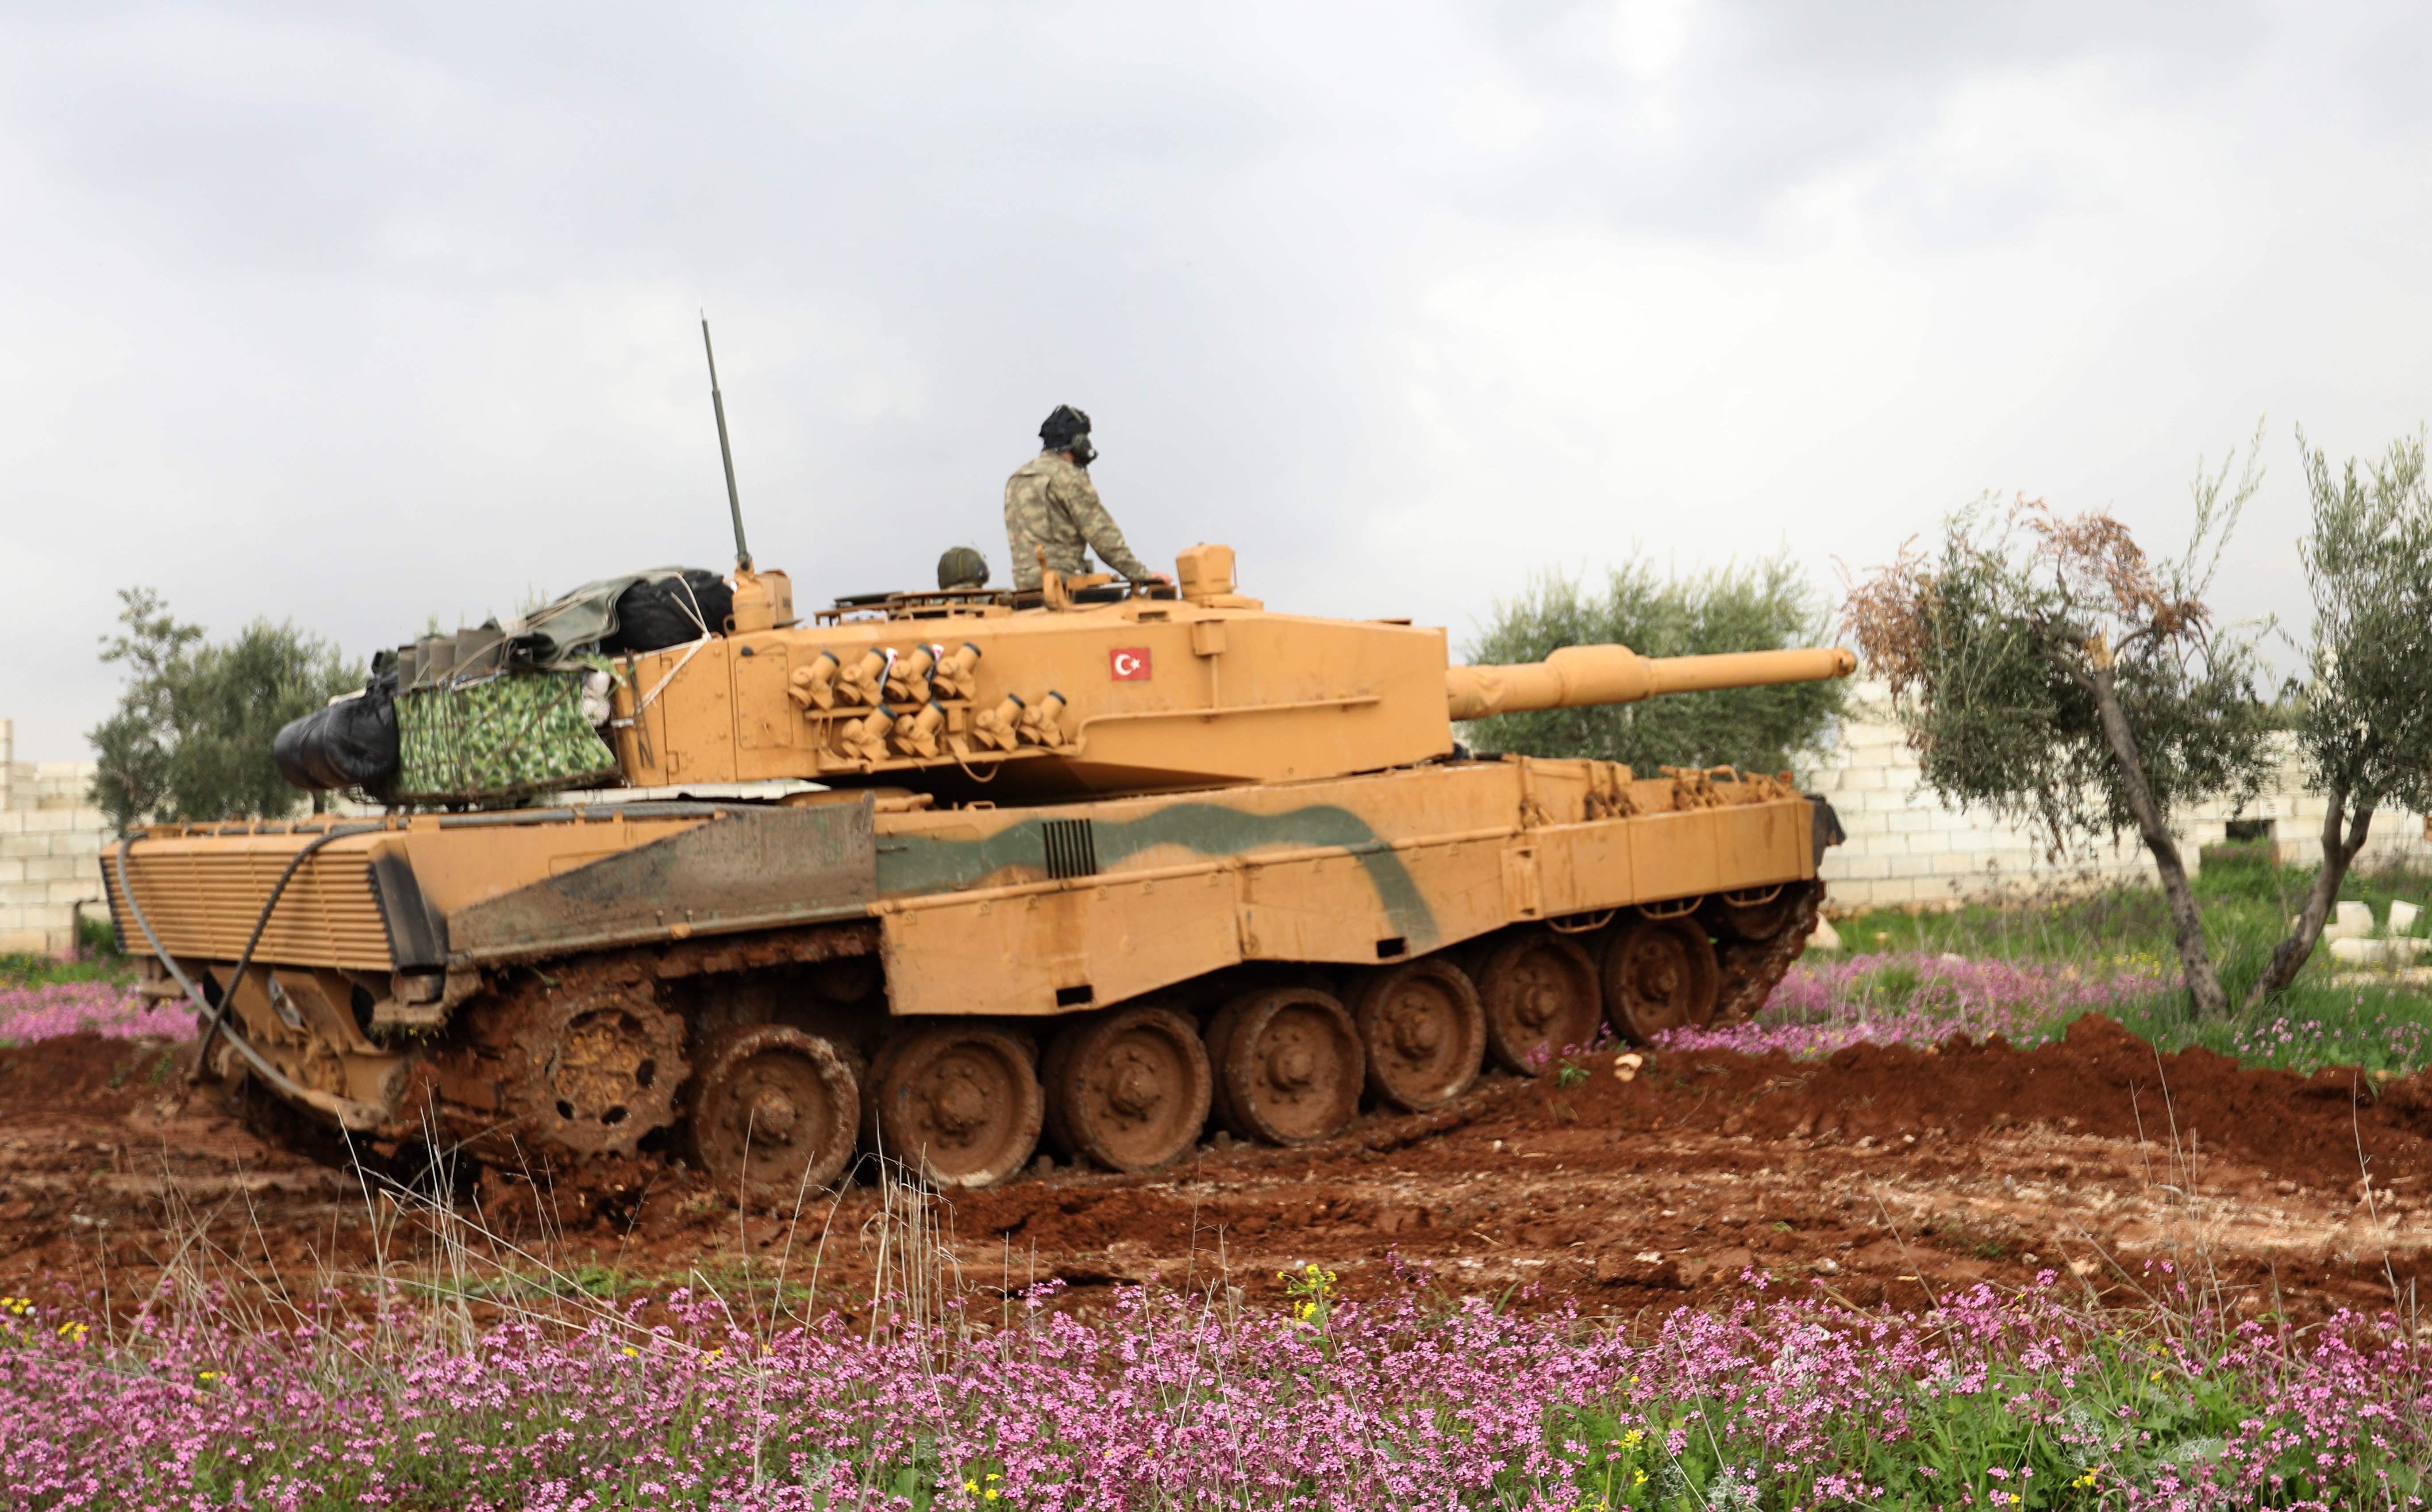 A Turkish tank on the outskirts of Jandaris town, southwestern Afrin, on Wednesday. Photo: Omar Haj Kadour/AFP